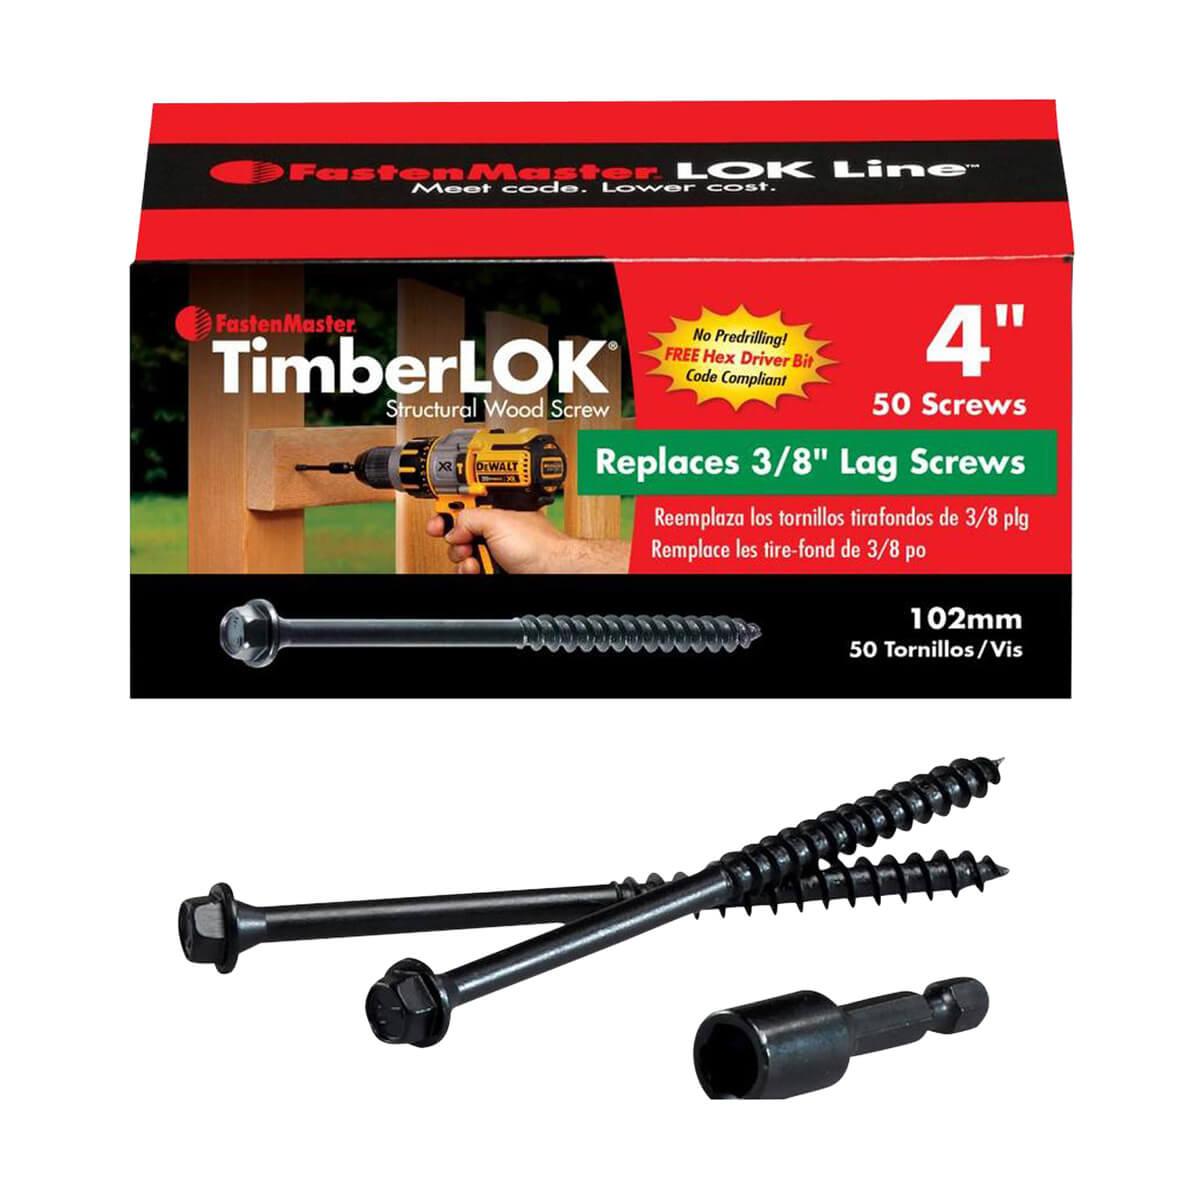 Fastenmaster - 4-in - Timberlok Screws - 50  Pack